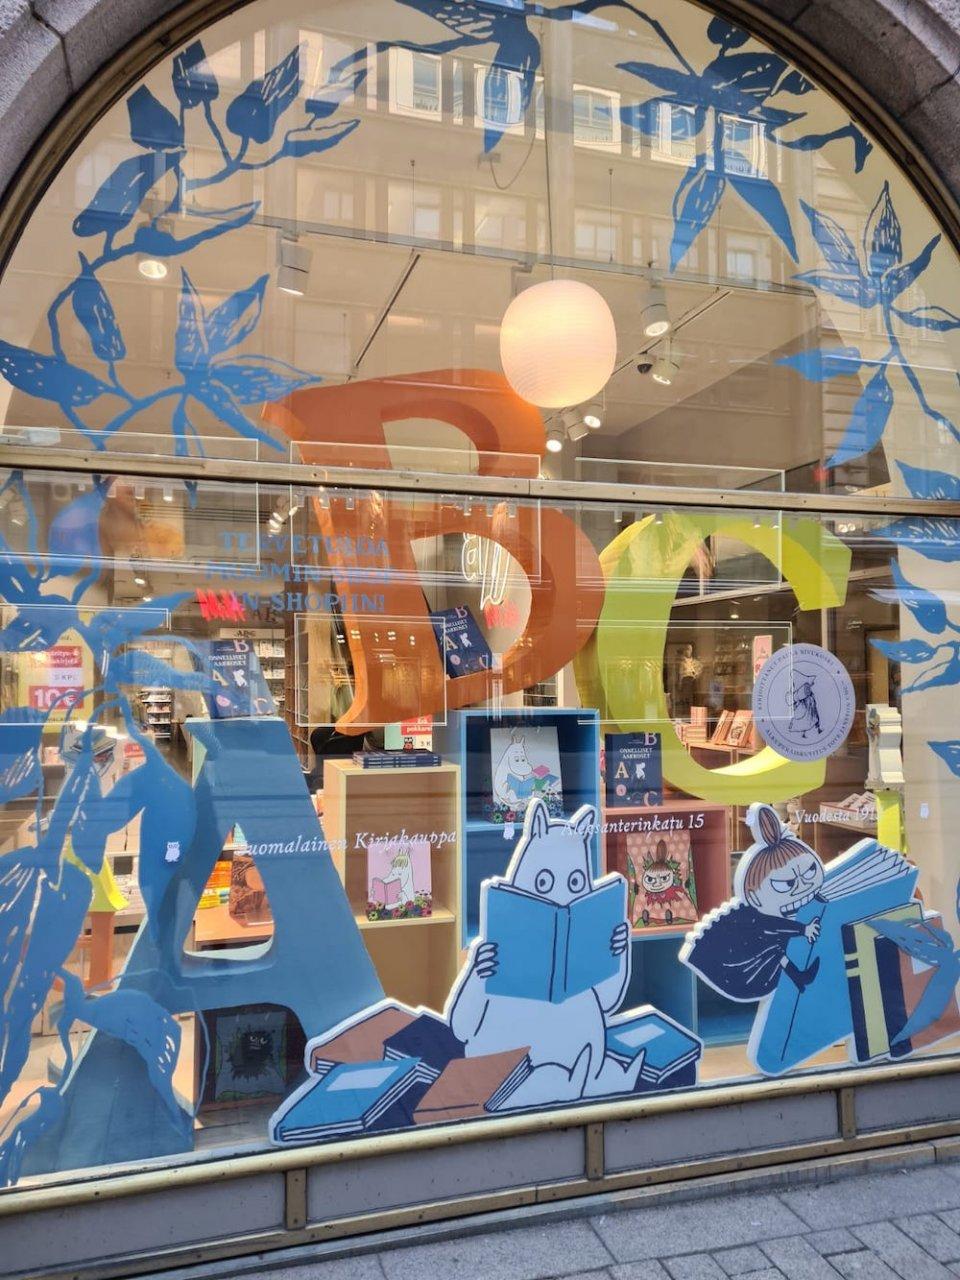 moomin shop-in-shop